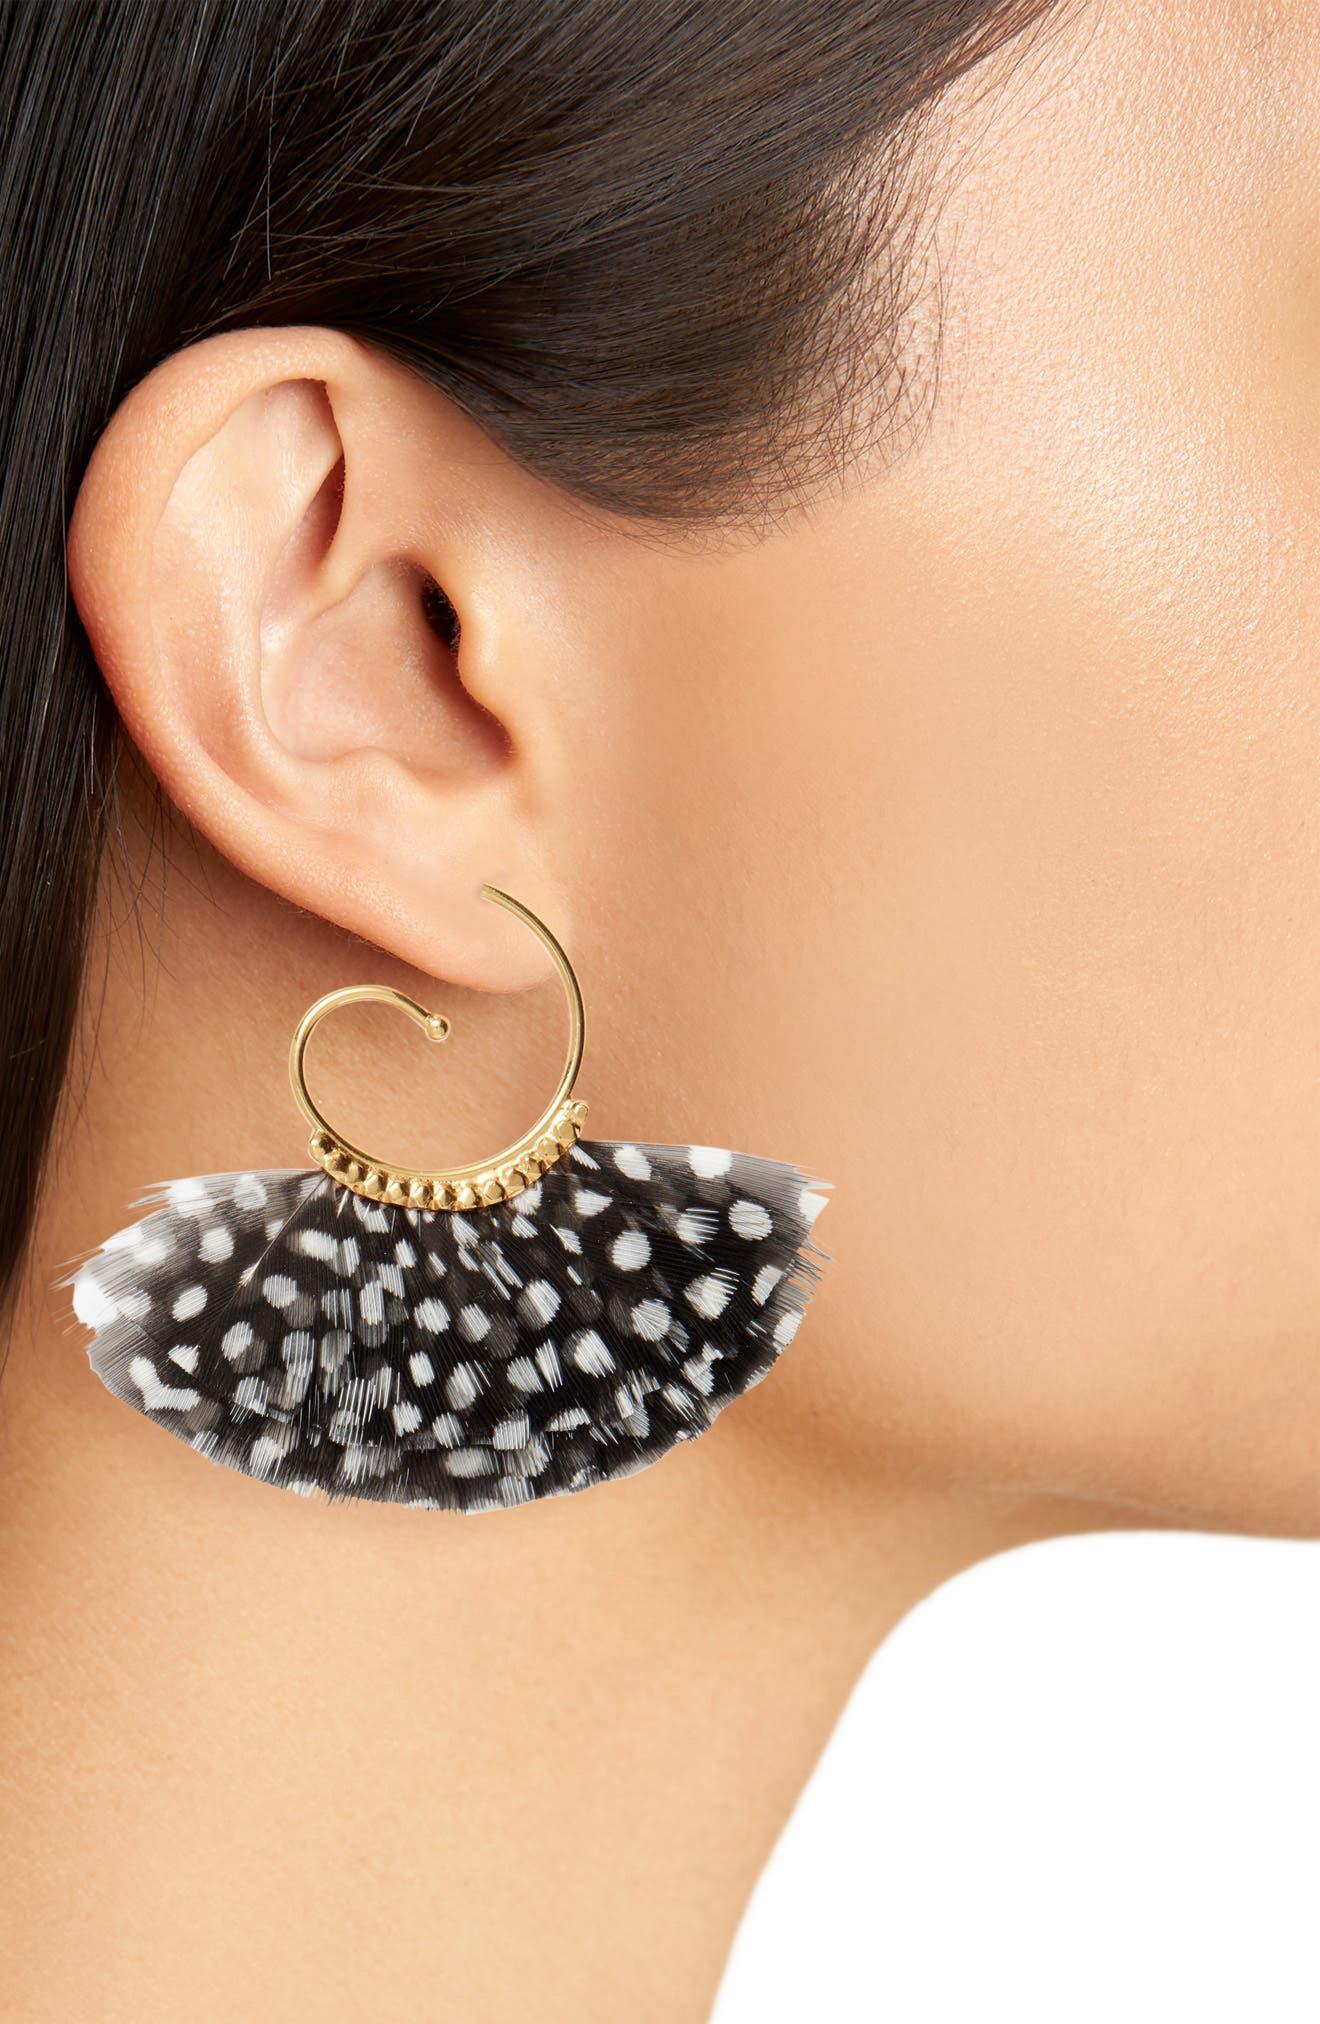 Buzios Feather Hoop Earrings,                             Alternate thumbnail 2, color,                             BLACK